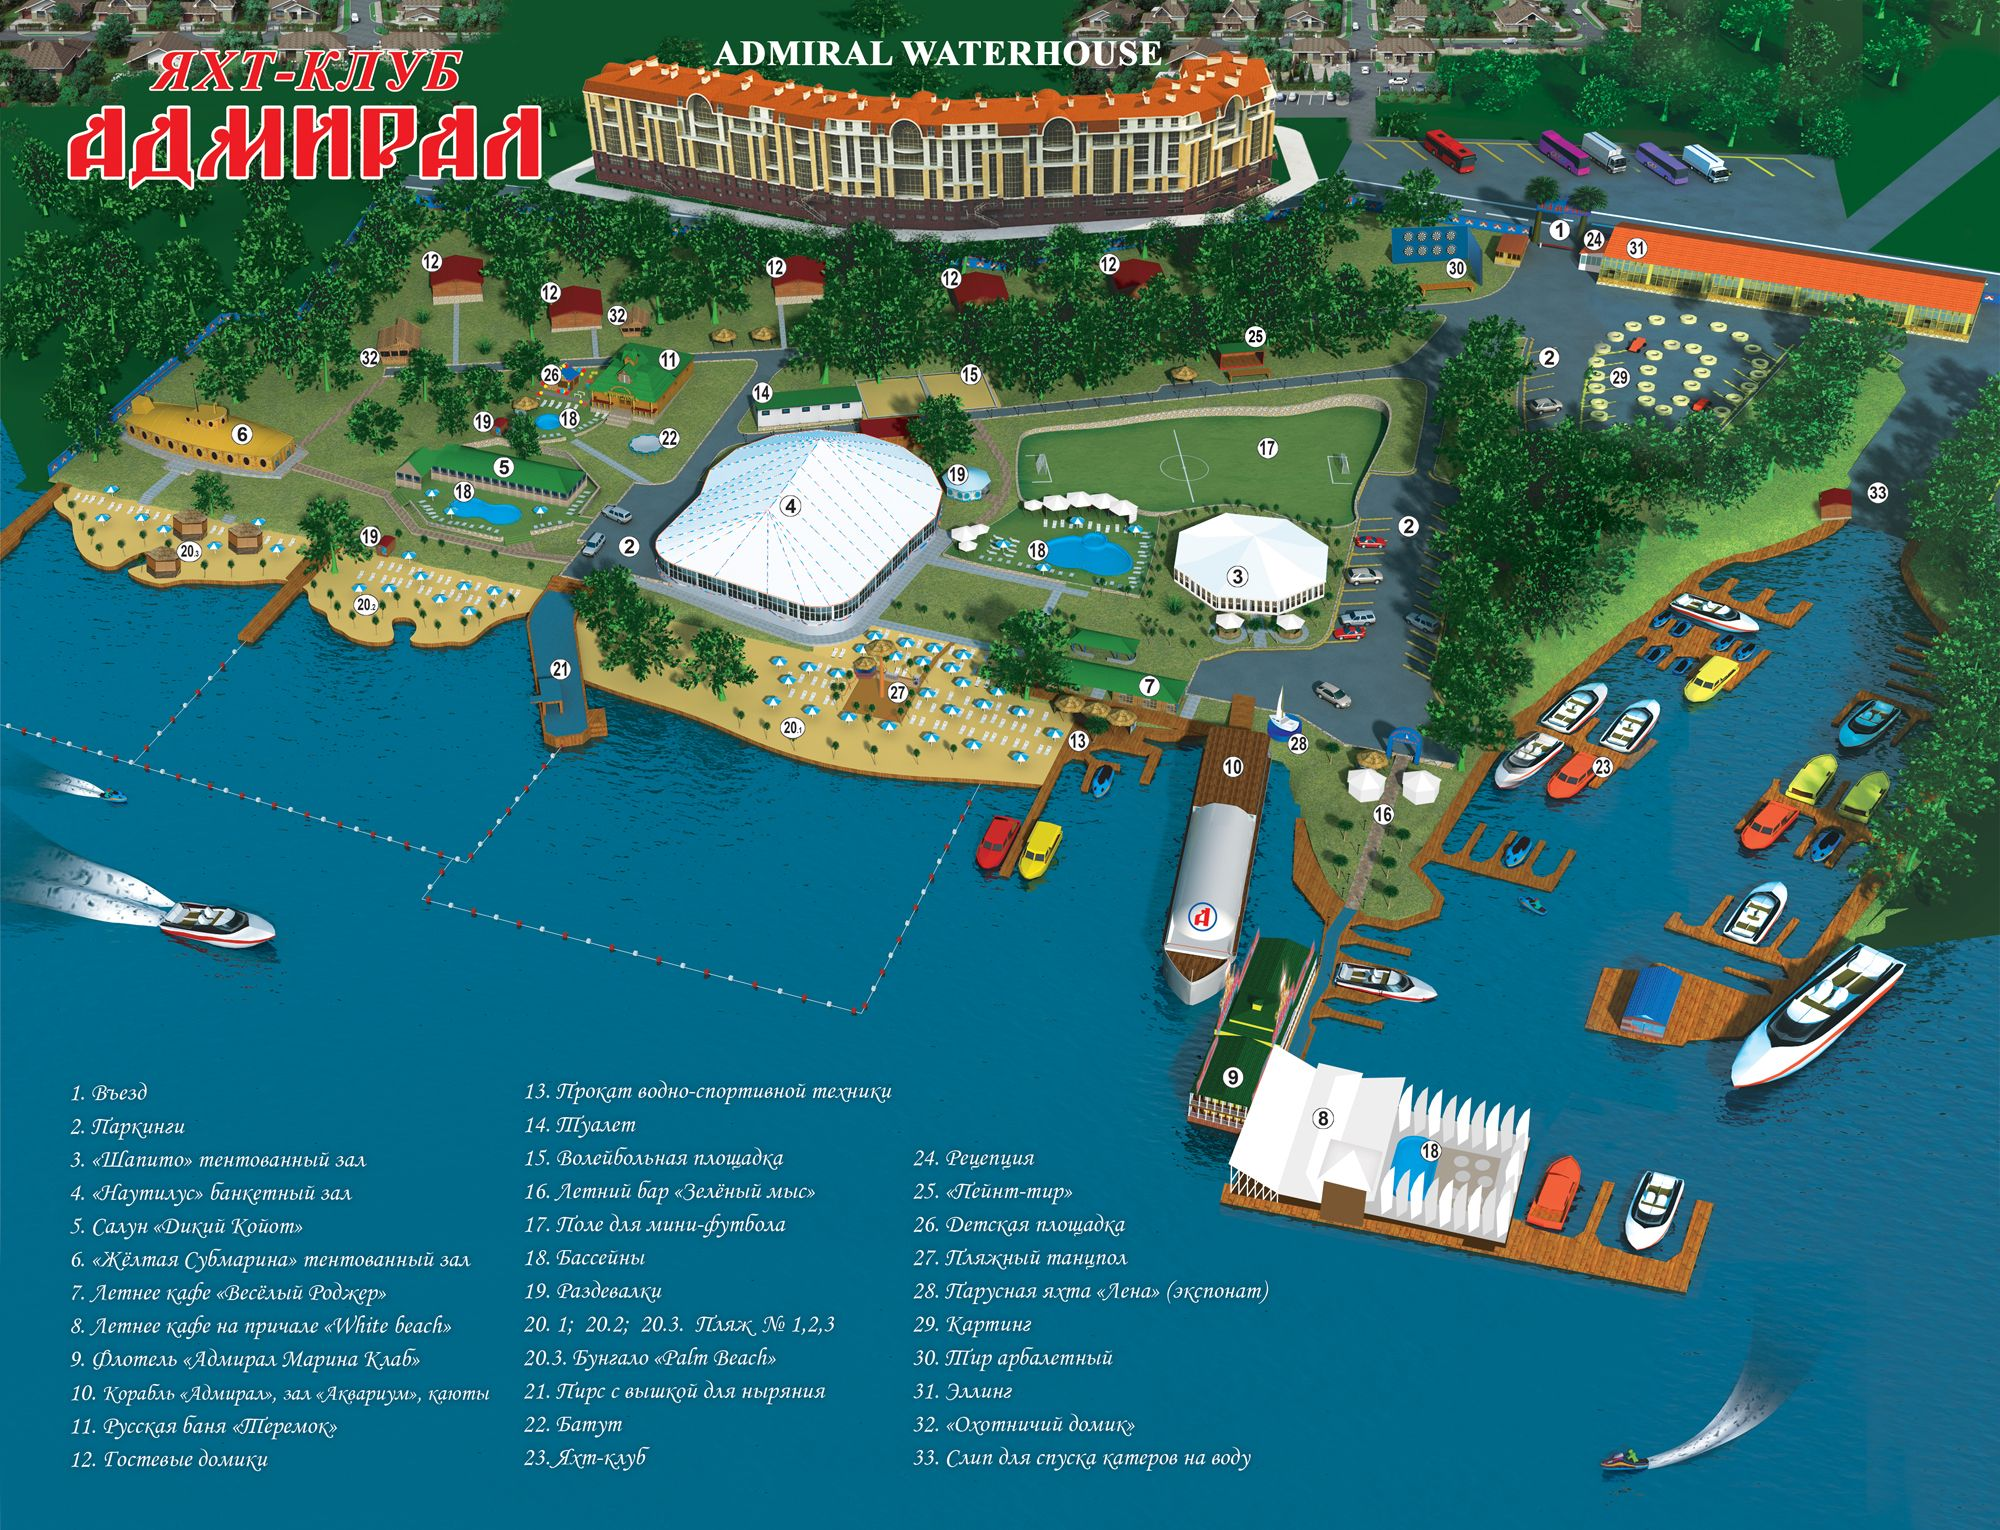 Яхт-клуб адмирал схема